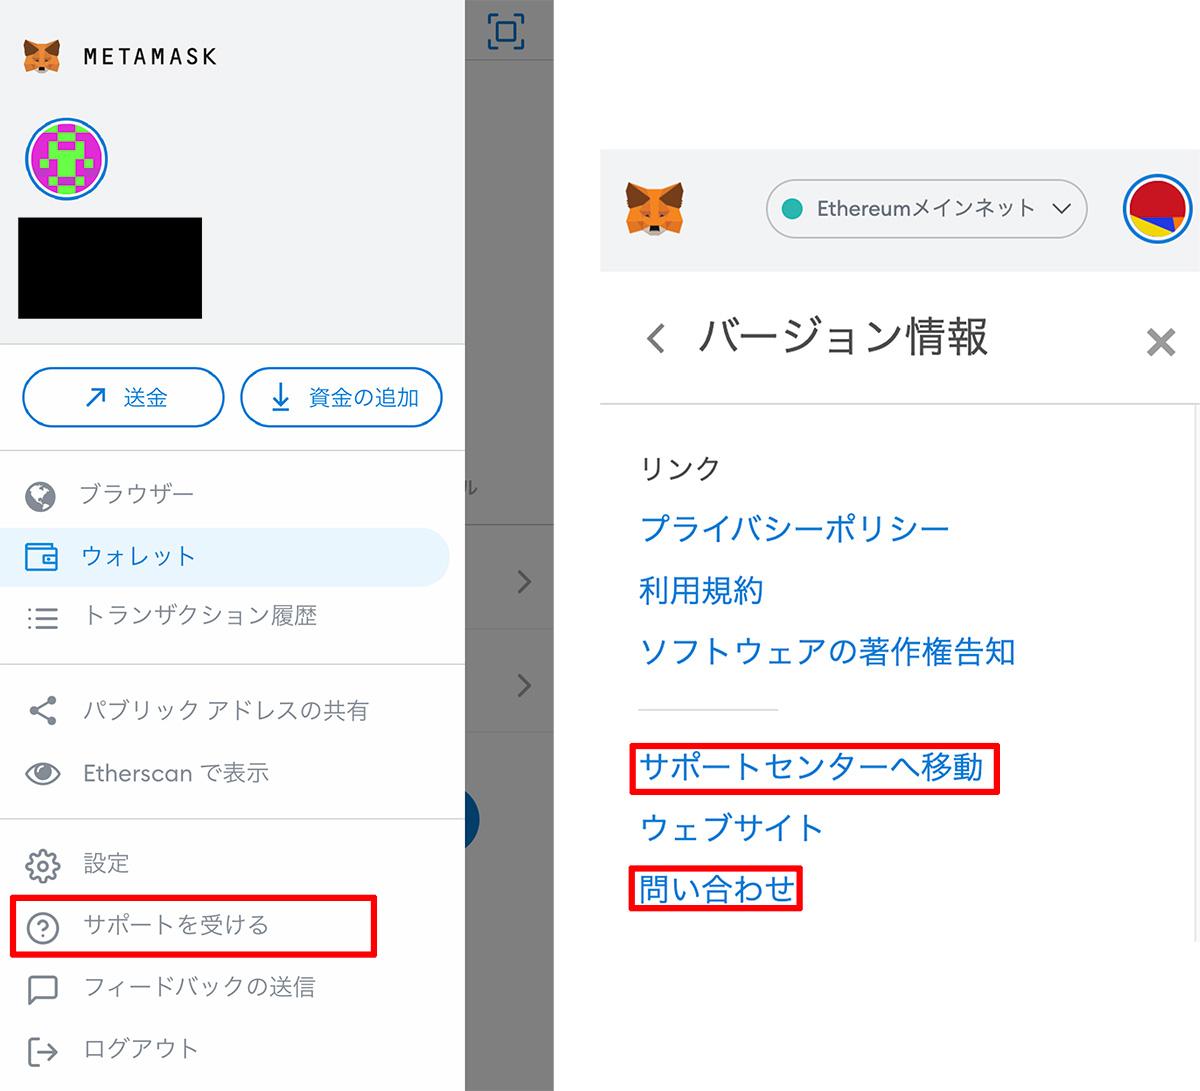 MetaMaskのアプリ(左)と拡張機能(右)のサポートボタン